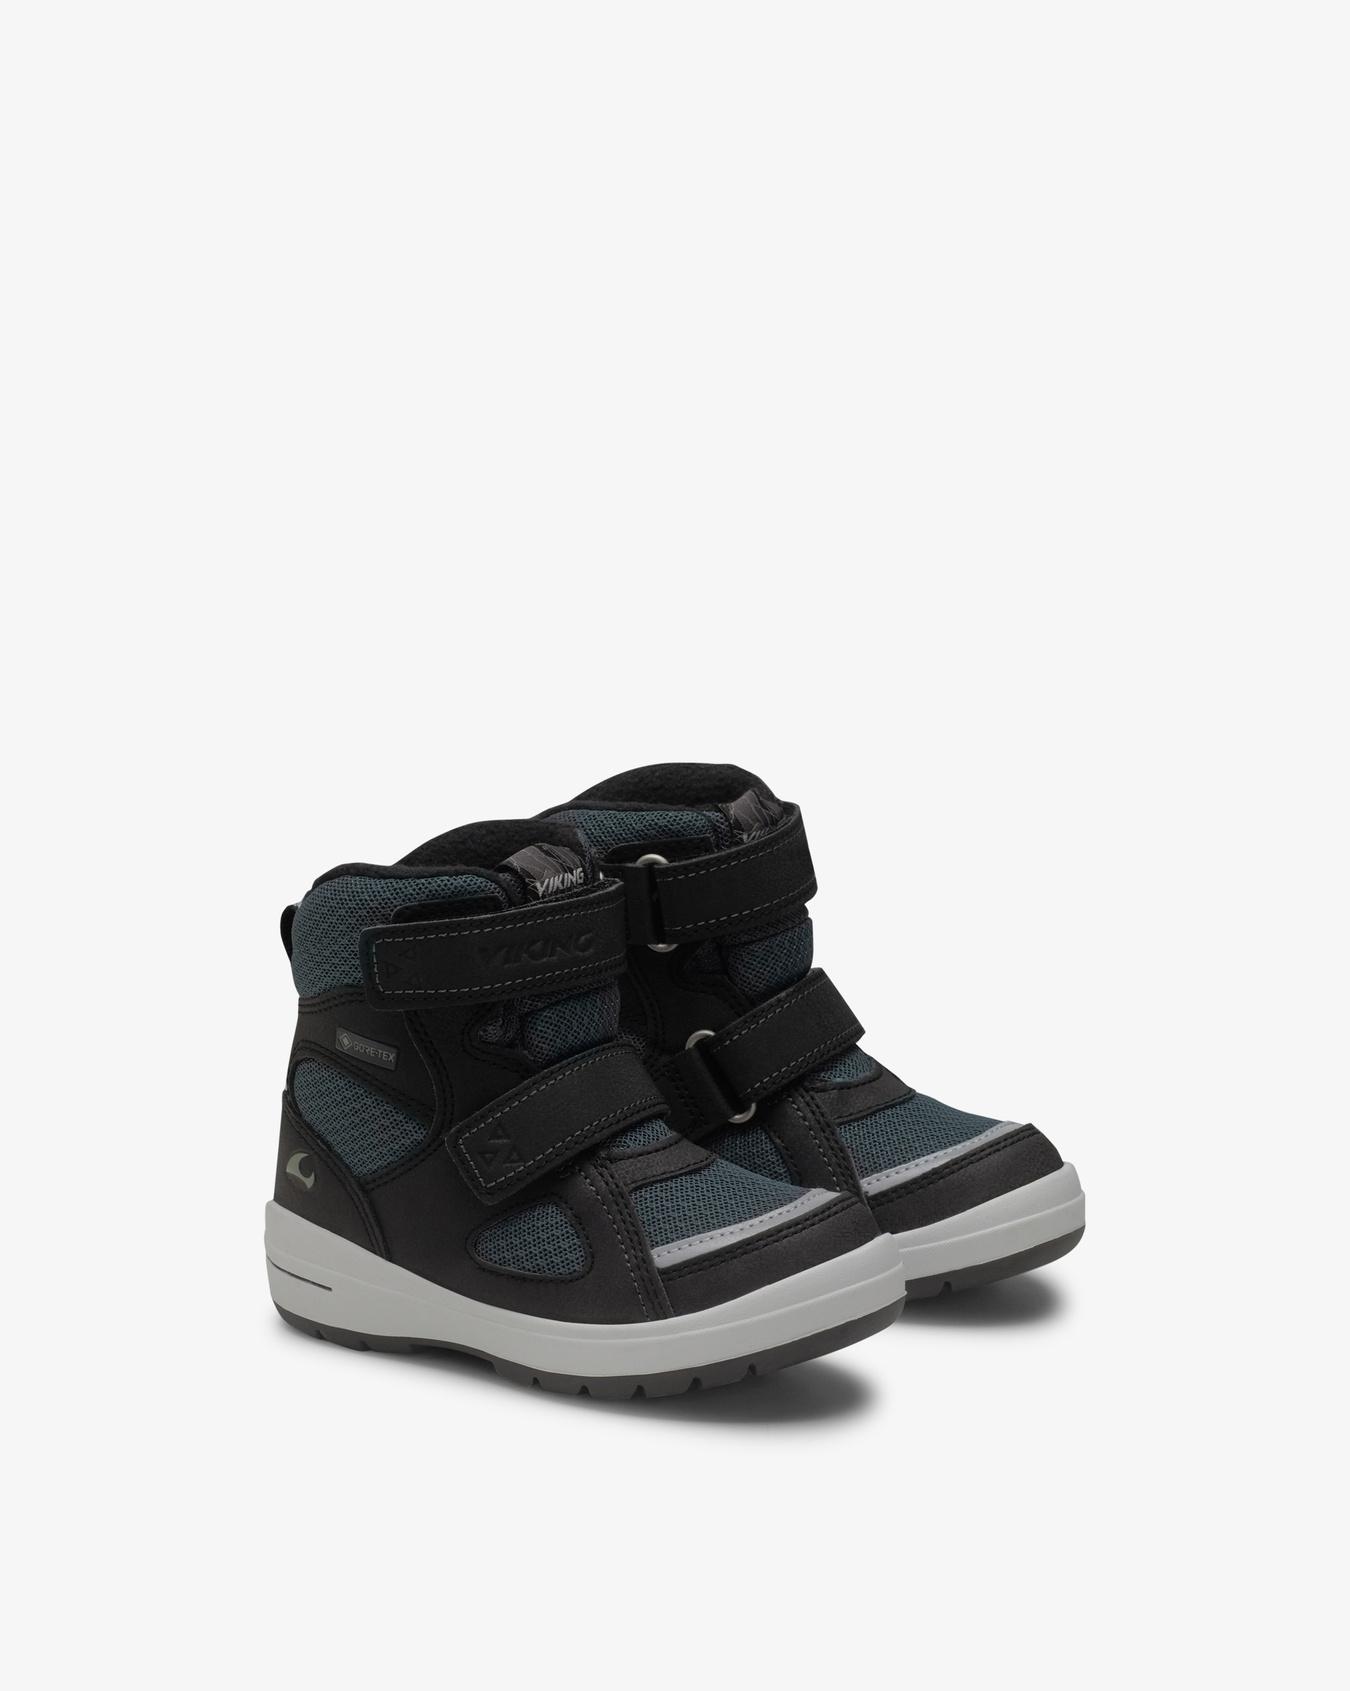 Spro GTX Black Winter Boots